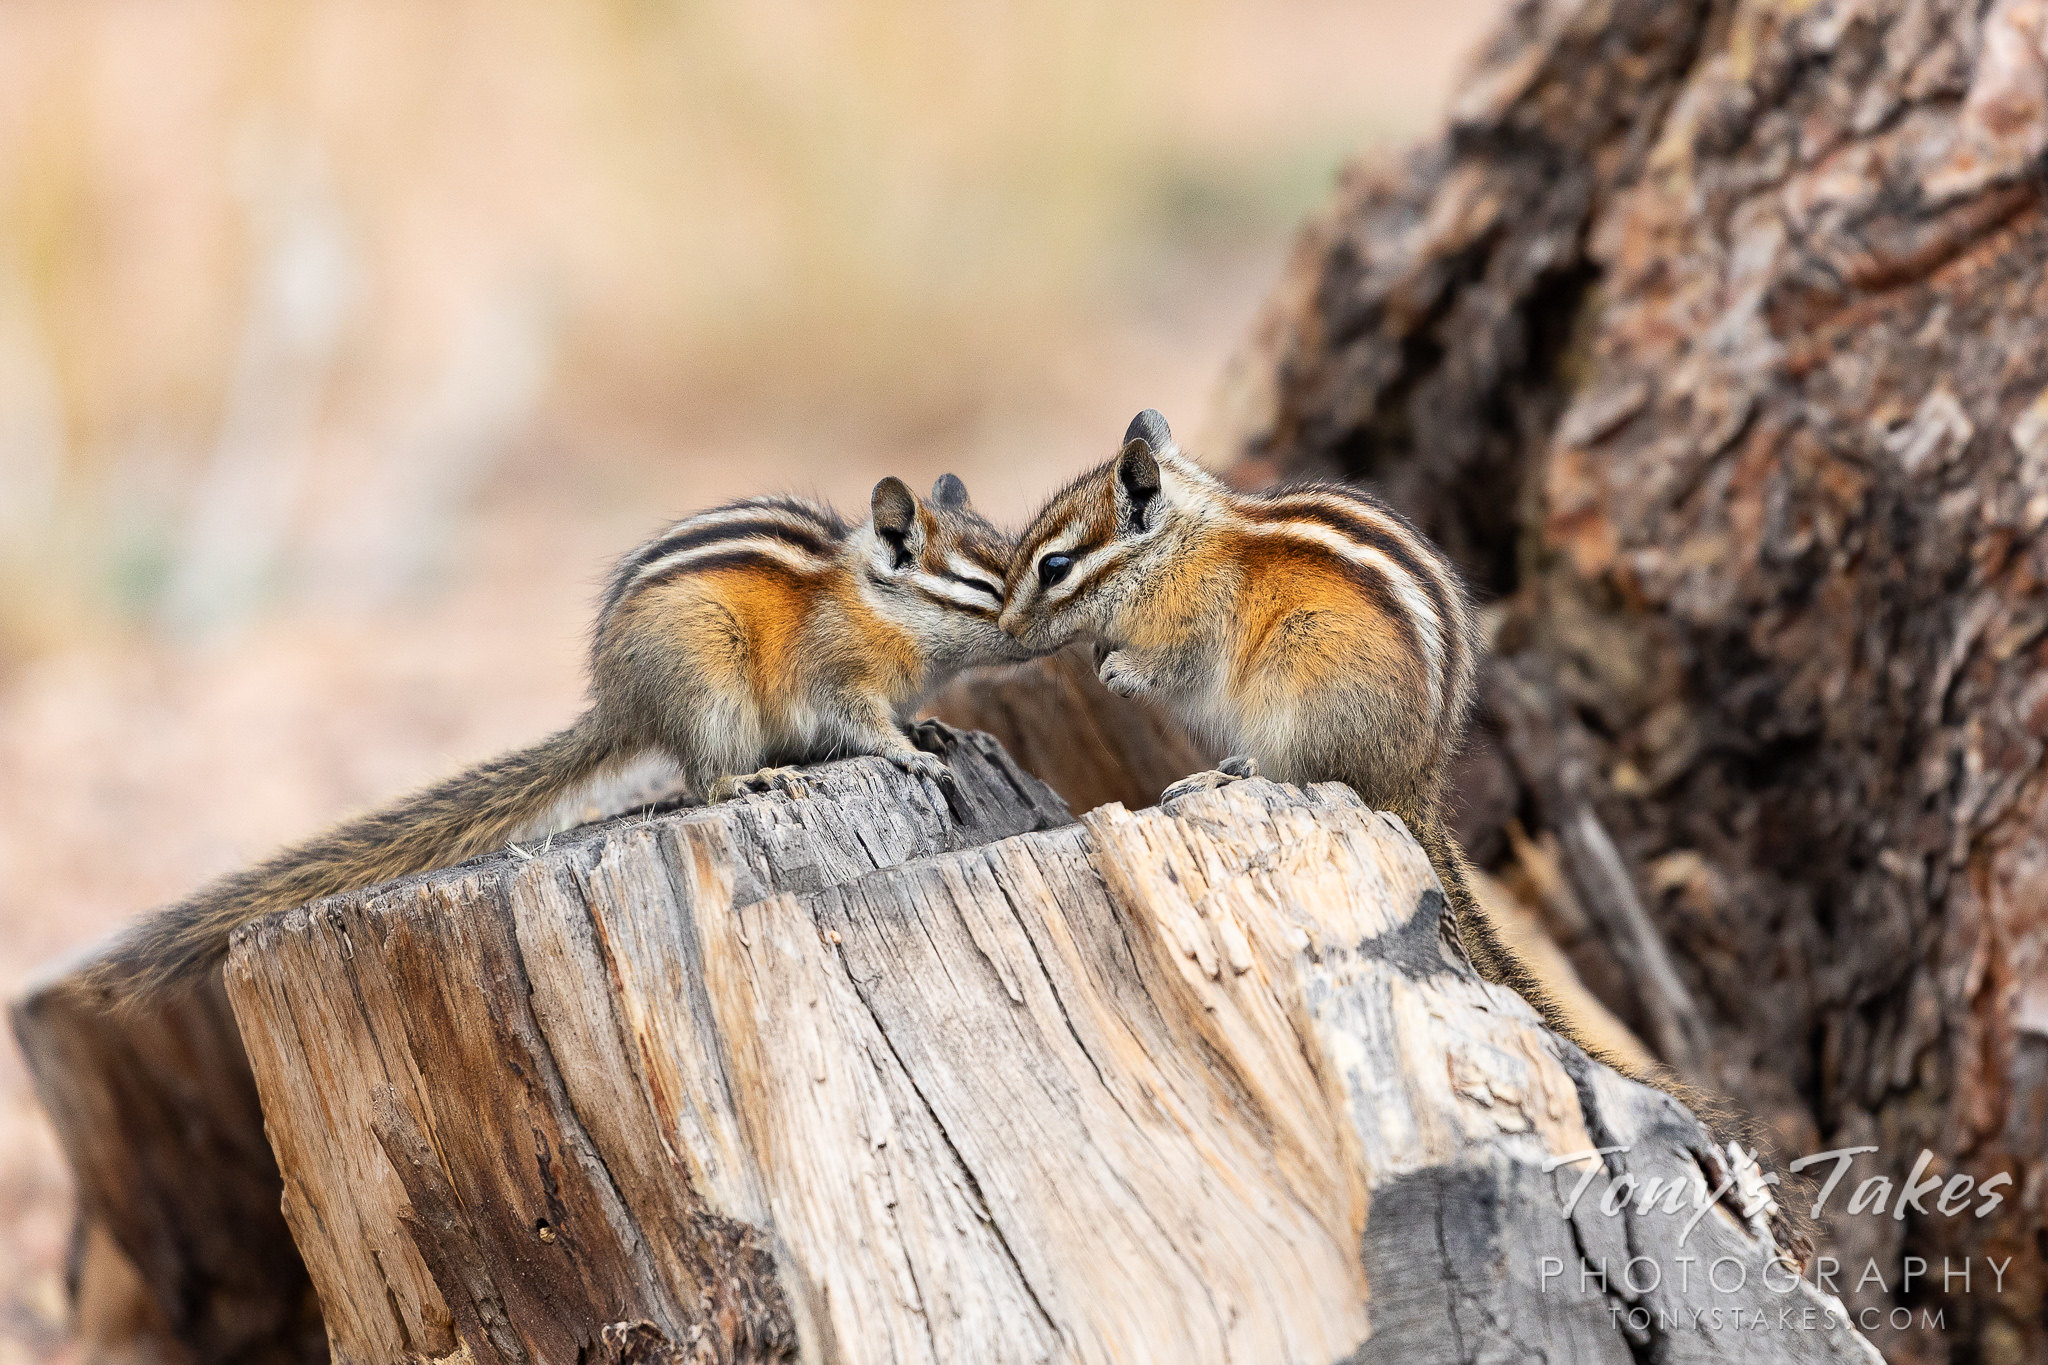 Snuggling chipmunks